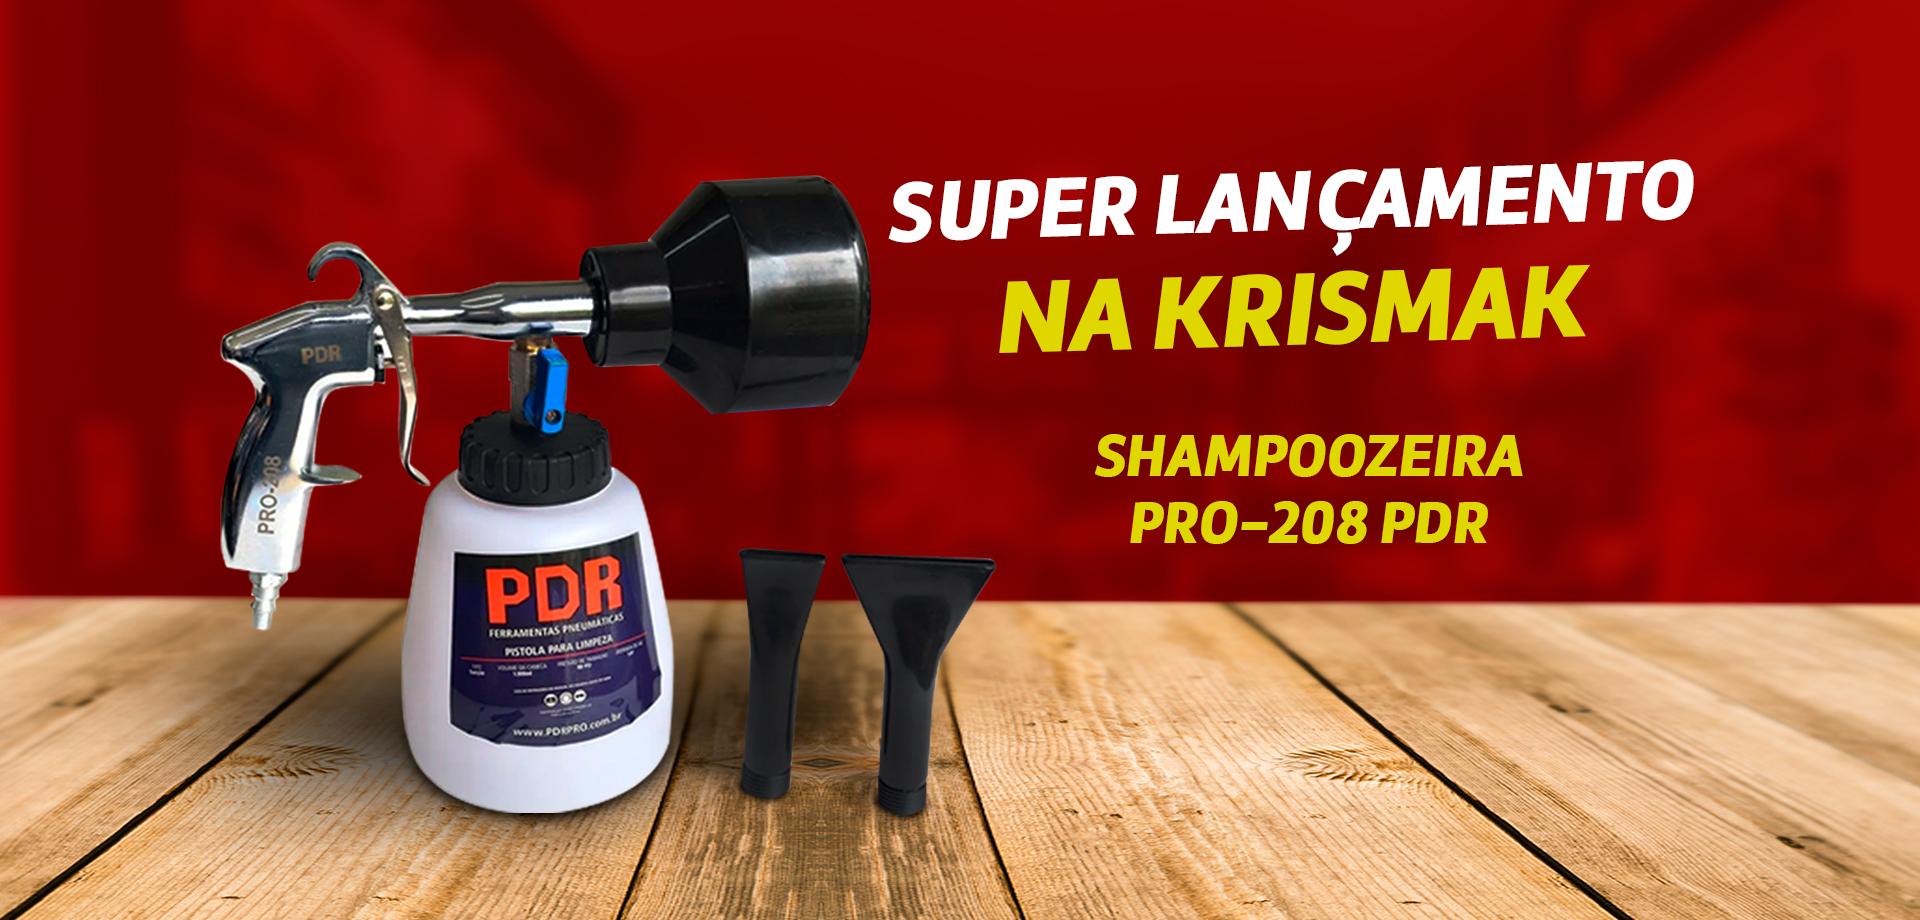 Shampoozeira Pro-208 PDR